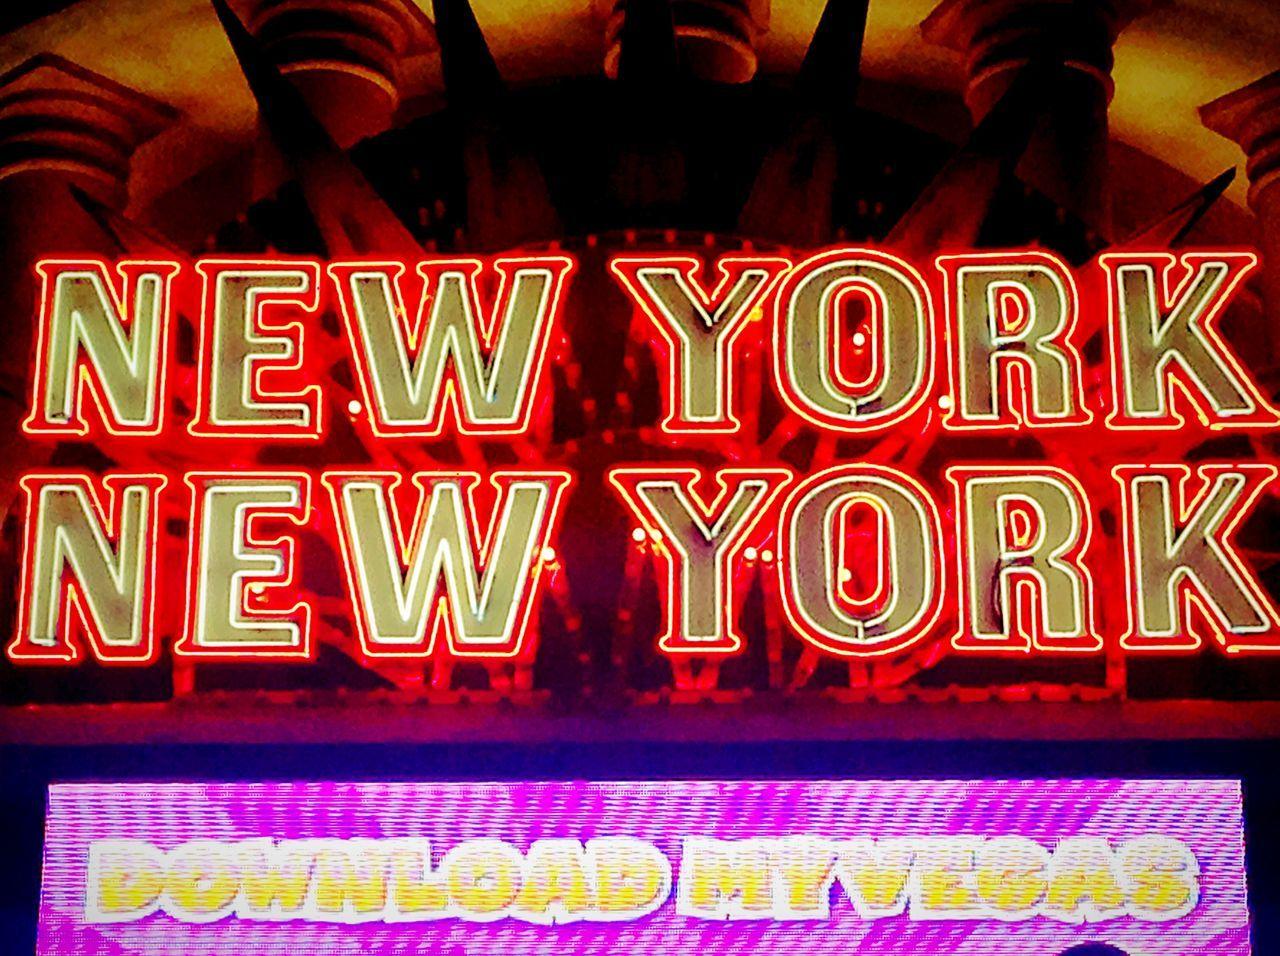 All The Neon Lights Newyorknewyork Las Vegas Neon Neon Lights Newyork Newyork Signs Sign